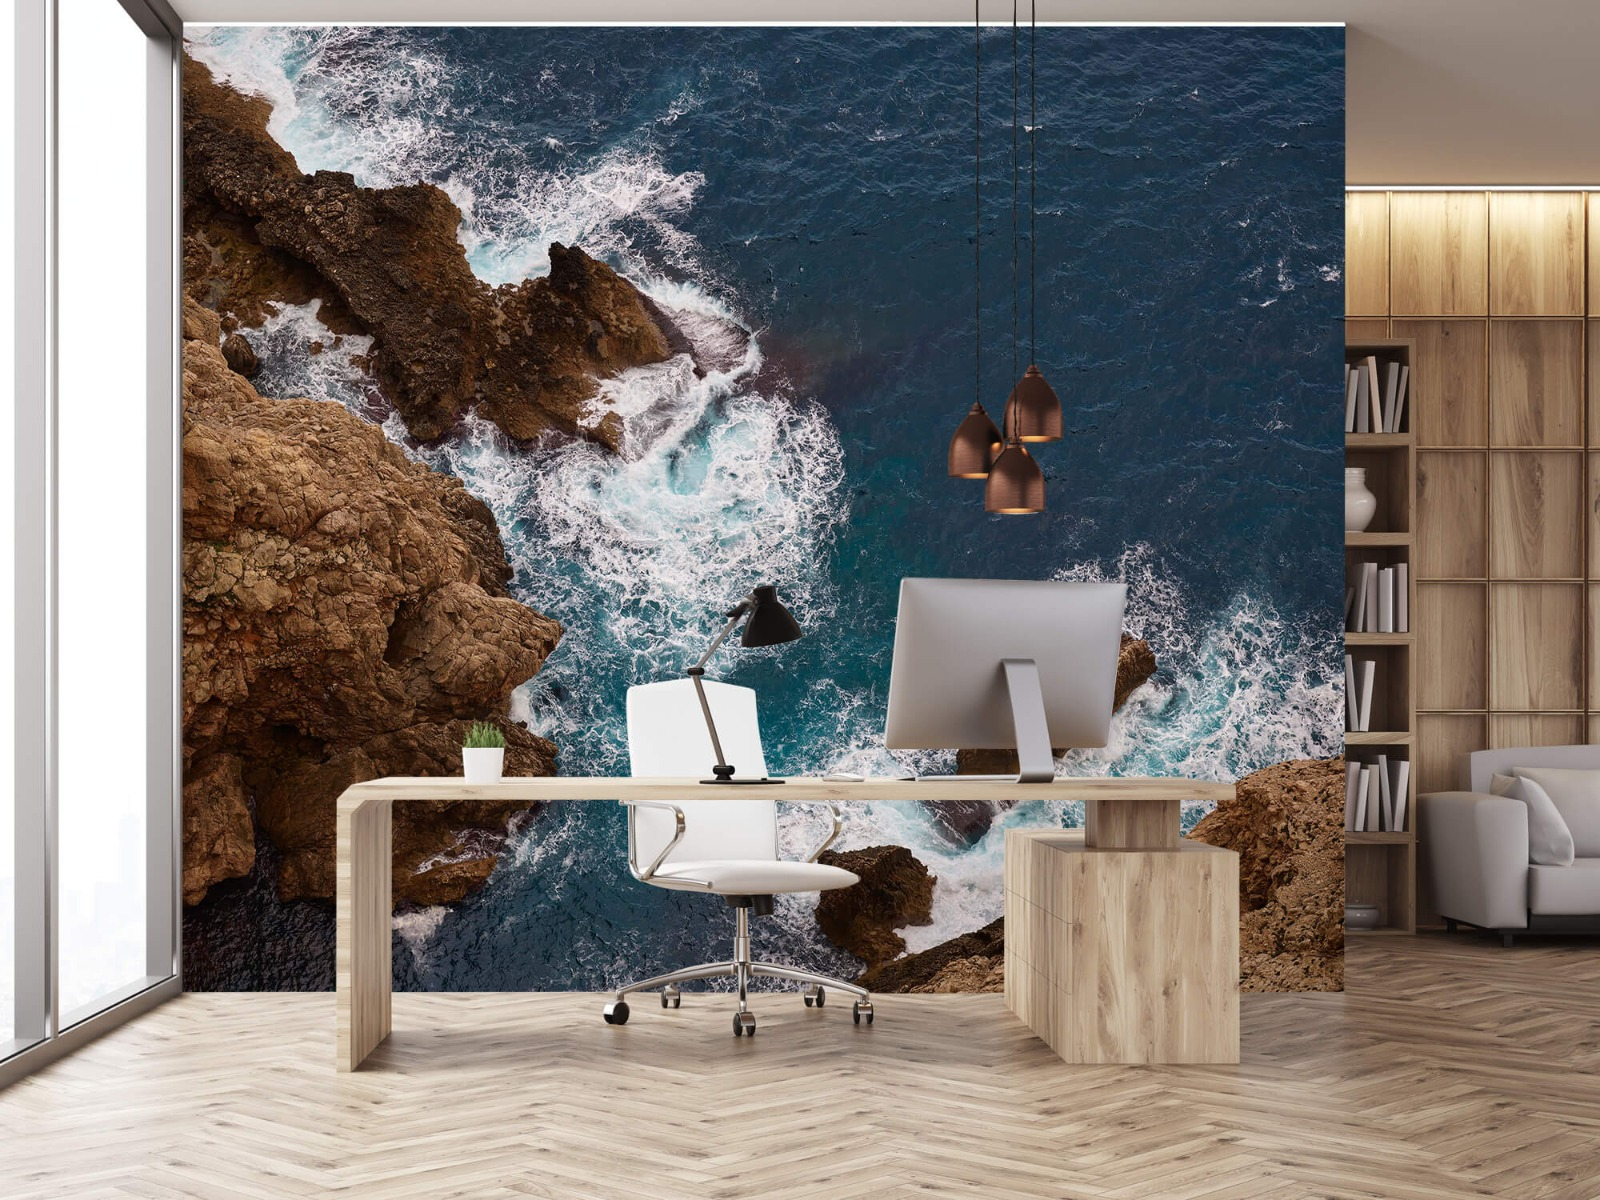 Zeeën en Oceanen - Kust rotsen - Slaapkamer 24